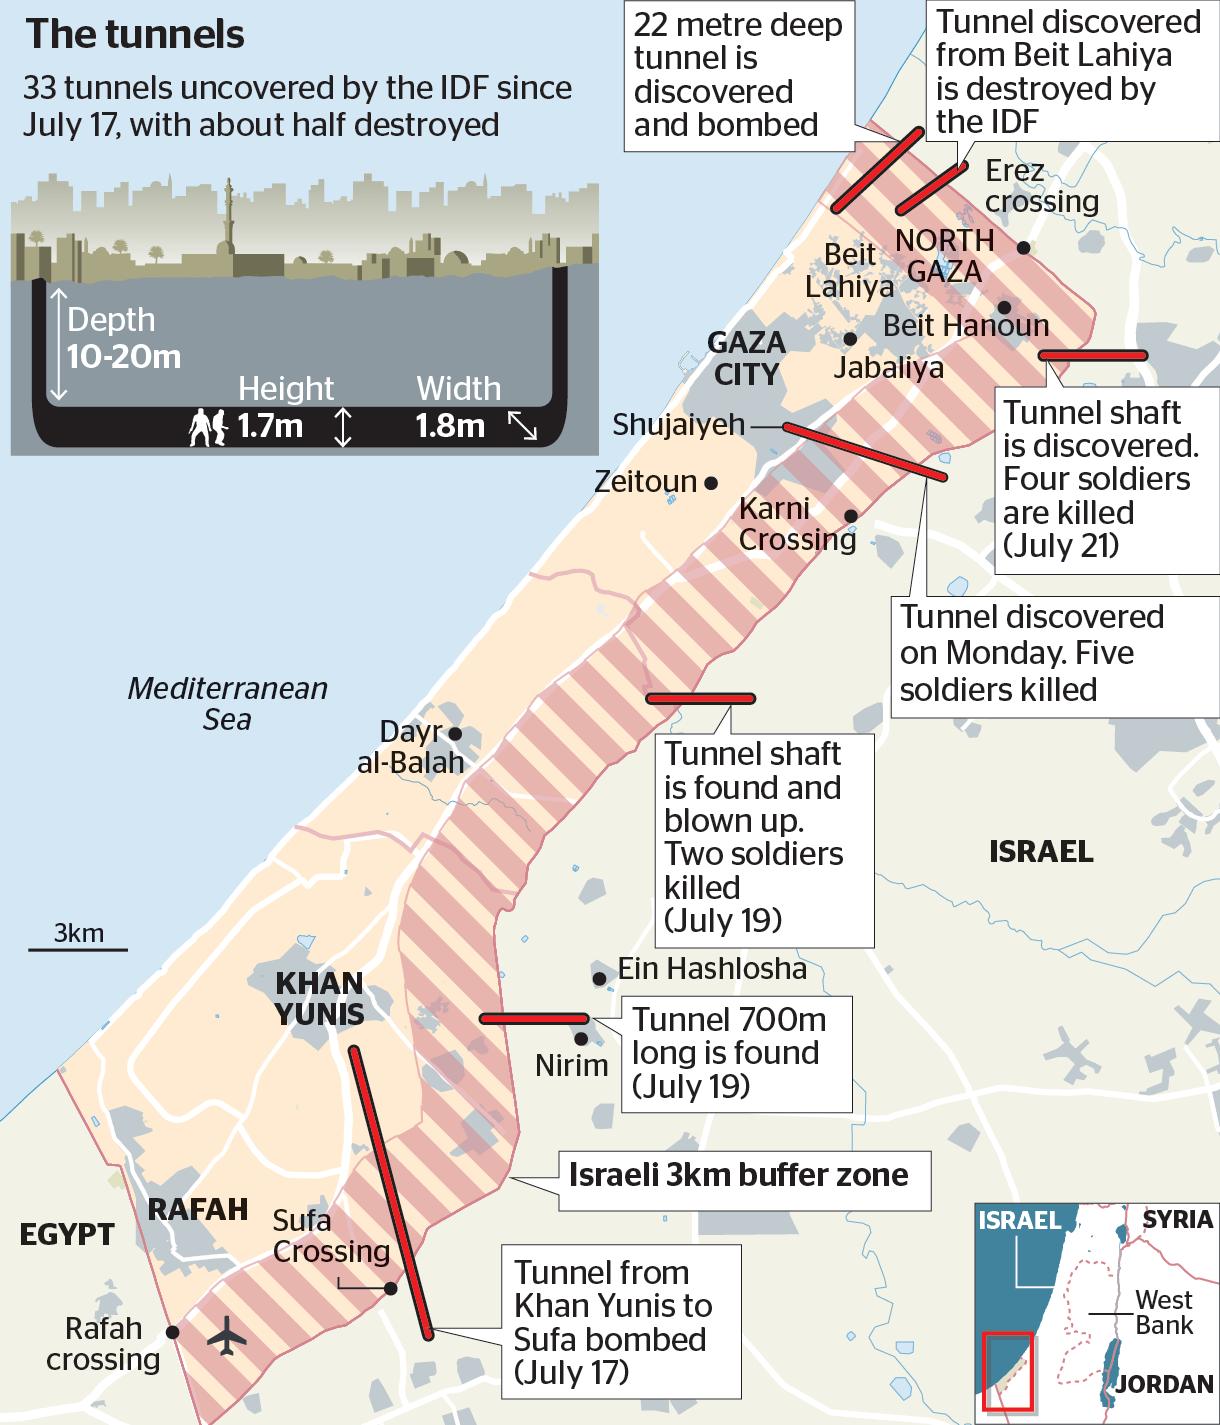 ISRAEL To Build A Massive Underground Wall On Gaza Border To Block - Map of zeitoun egypt